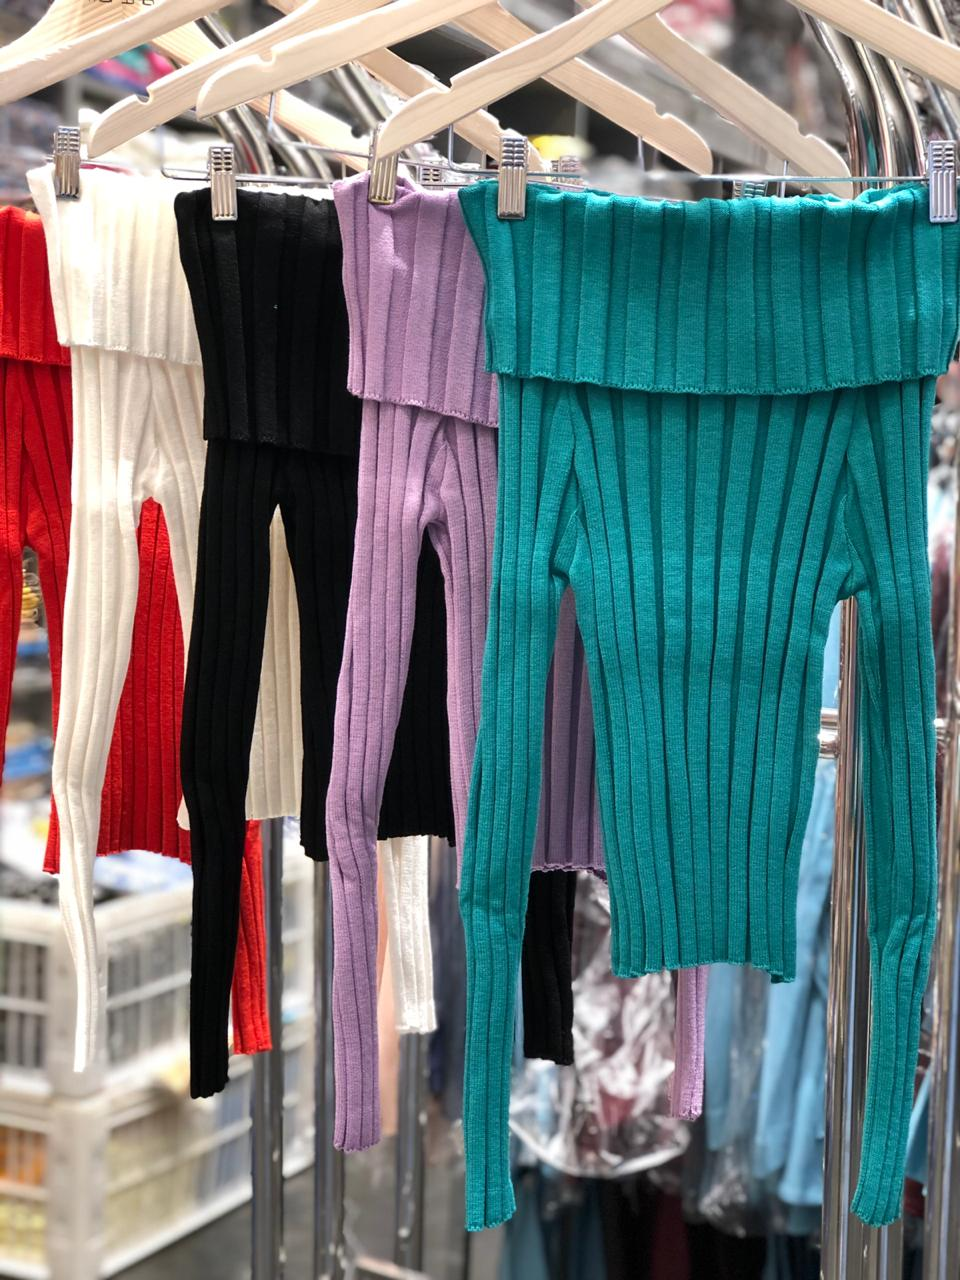 Blusa Tricot Morina Modal  Canelado Ombro a Ombro Cores Off, Verde, Lilas, Vermelho e Preto